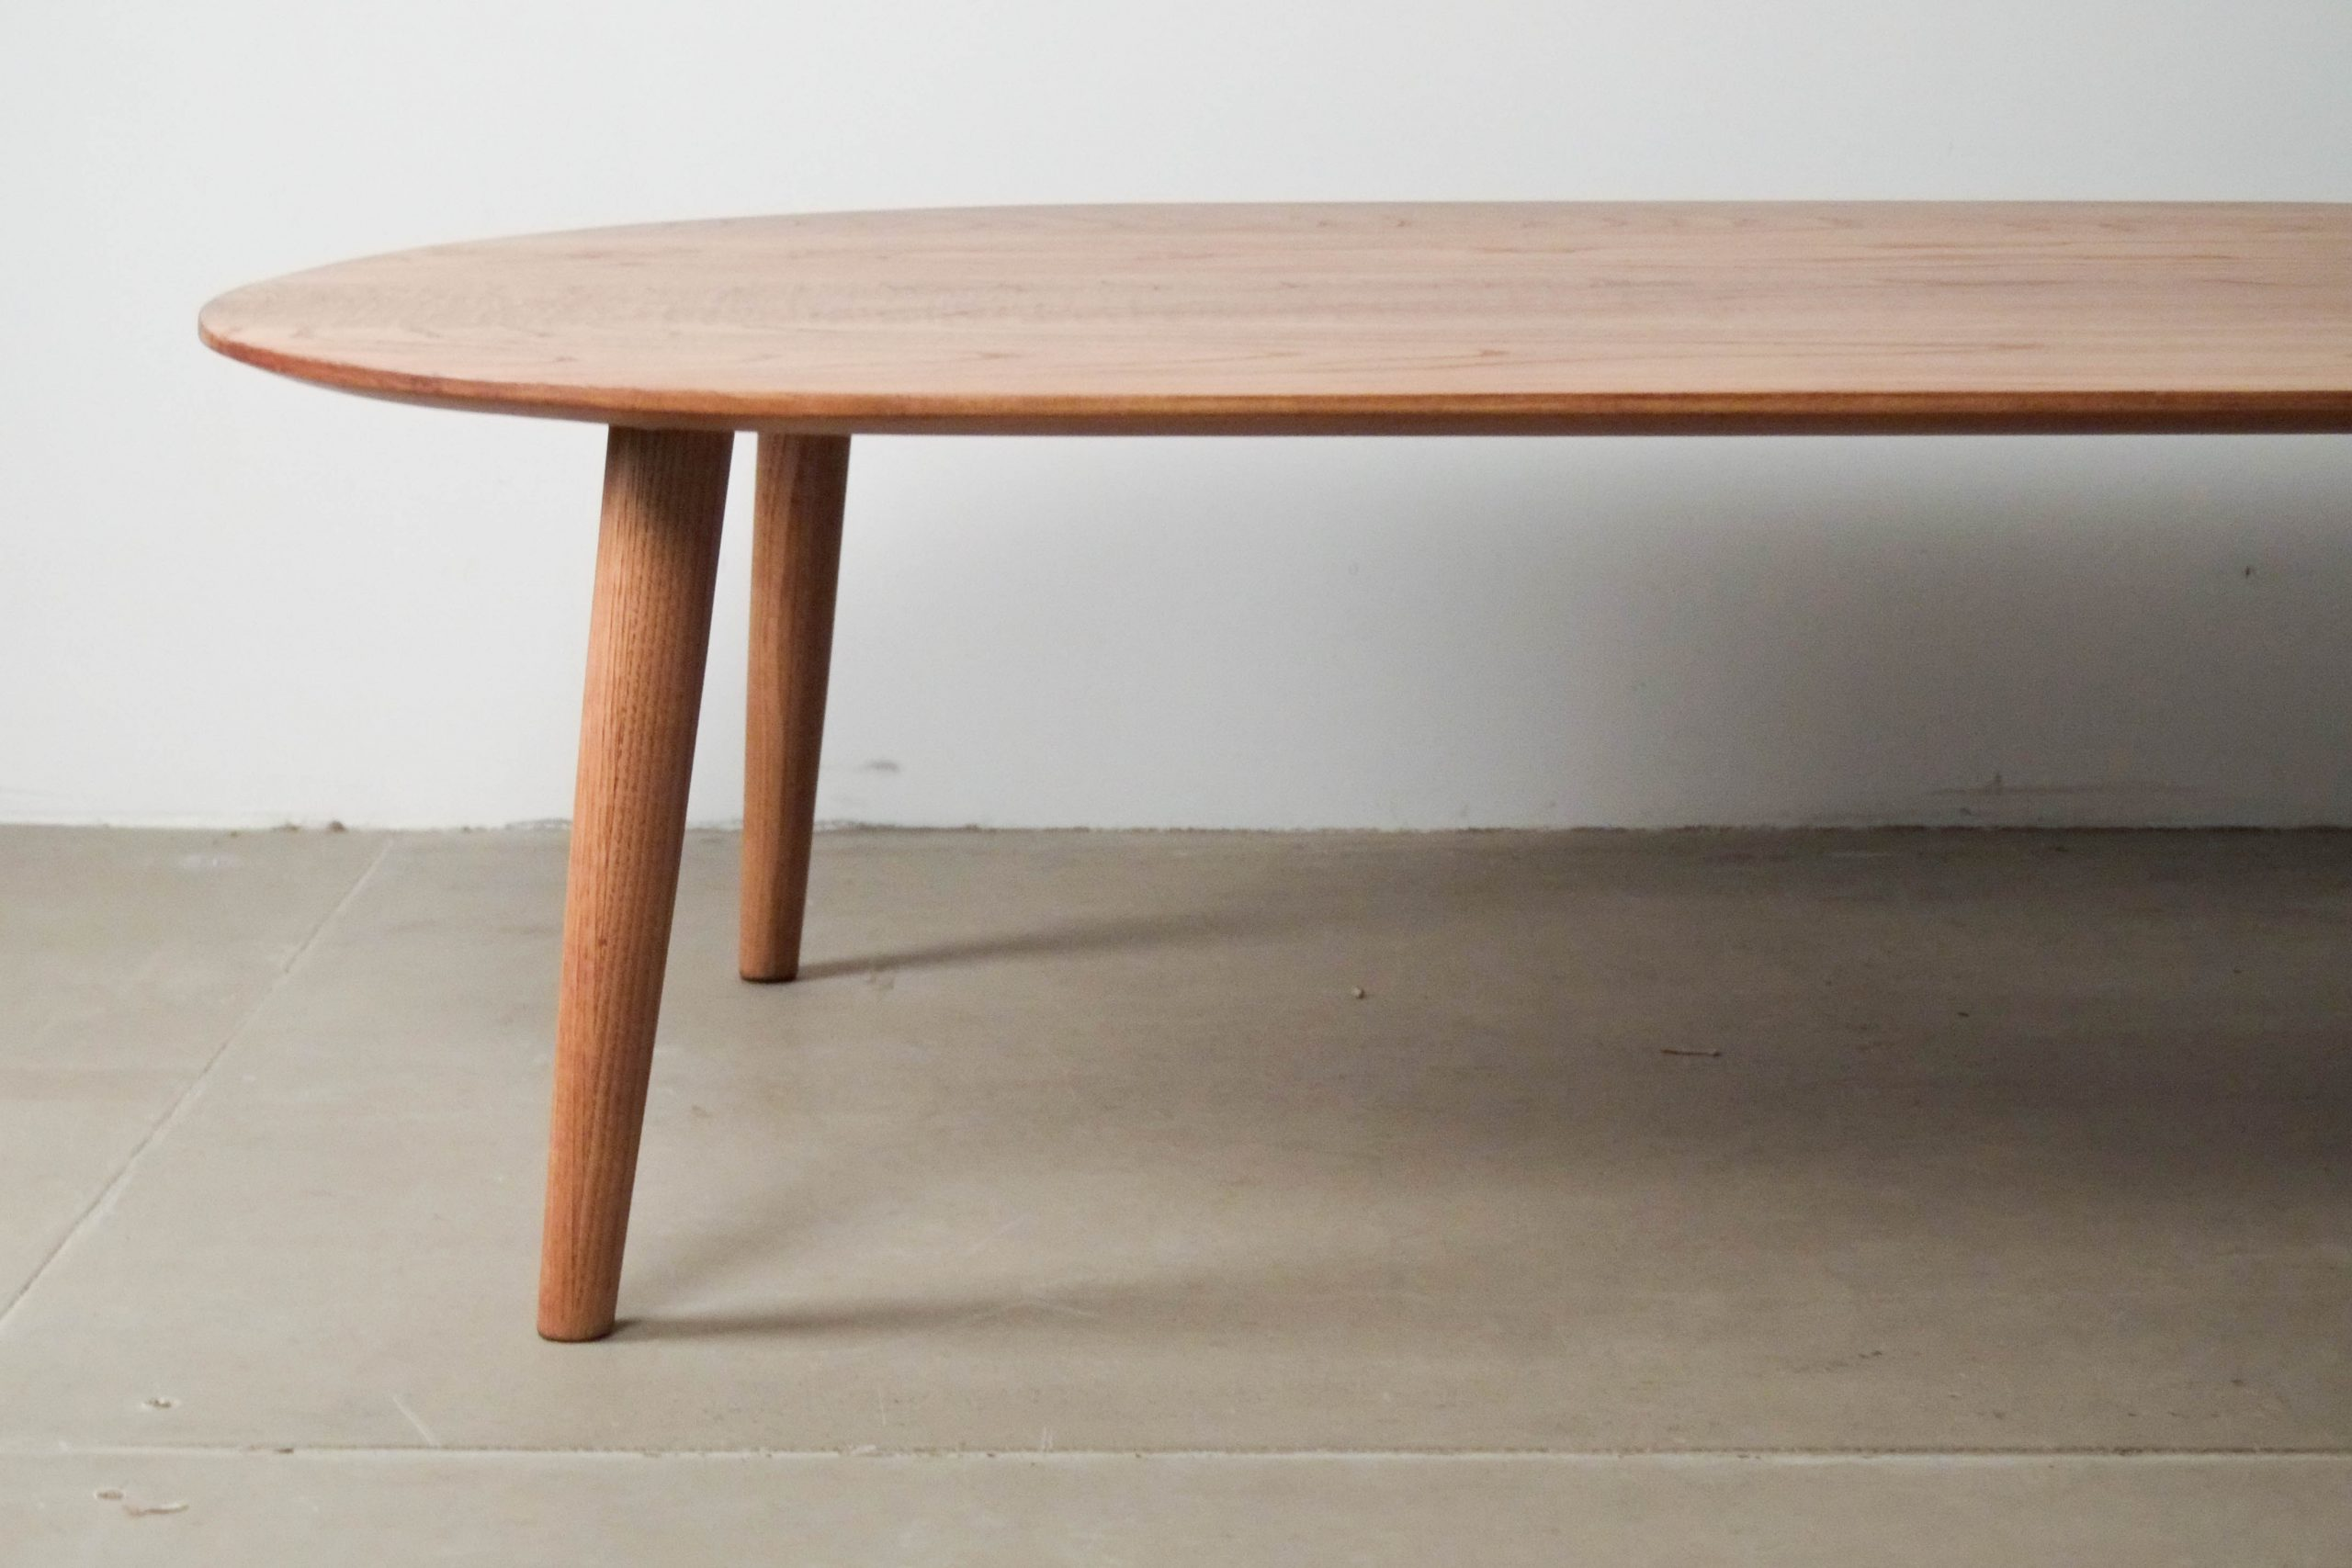 mesa de madera pata redondeada biselada